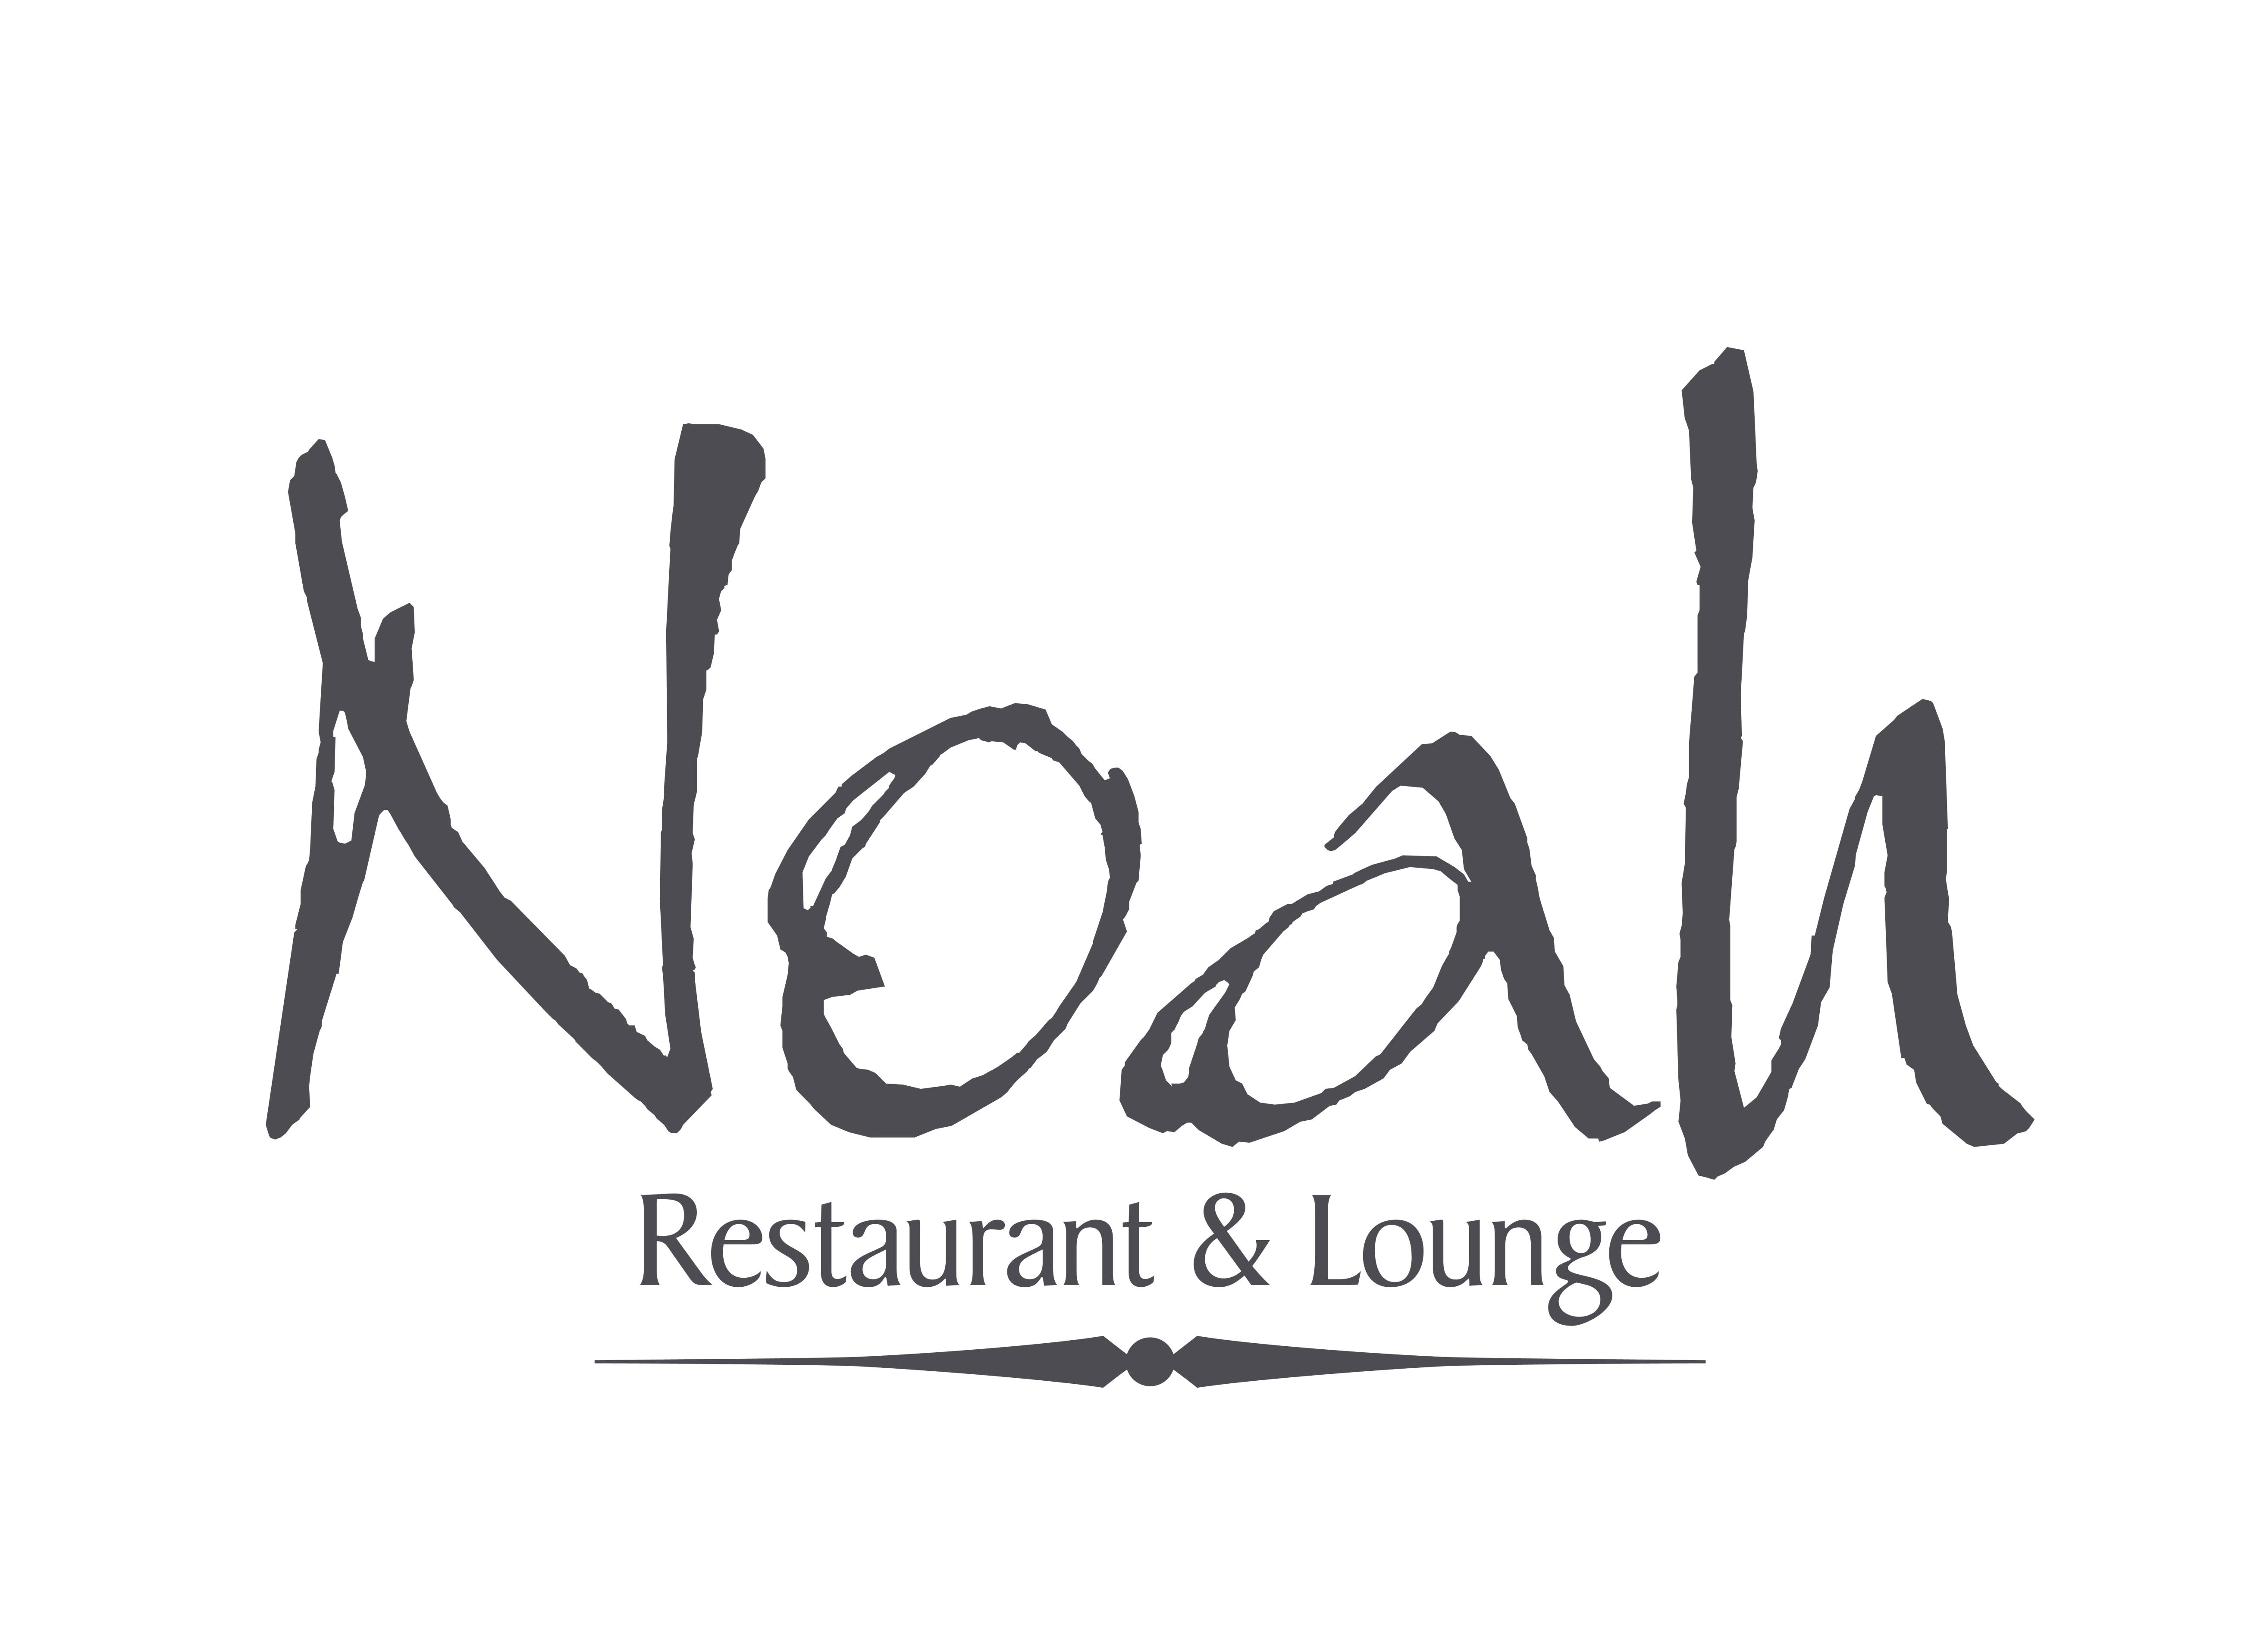 Noah Restaurant & Lounge Logo